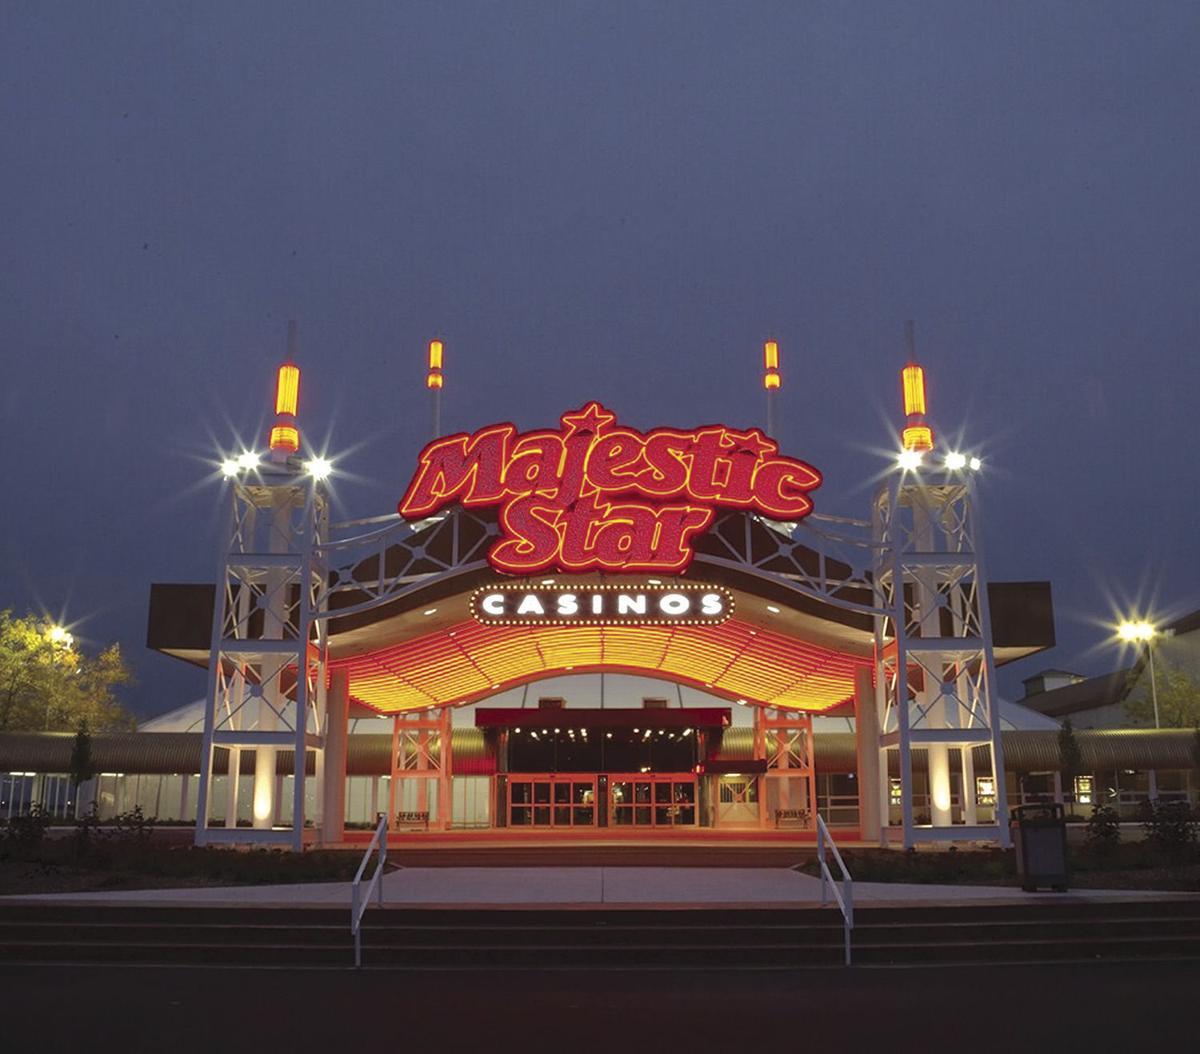 Majestic star casino indiana buffet sugarhouse casino jobs philadelphia pa